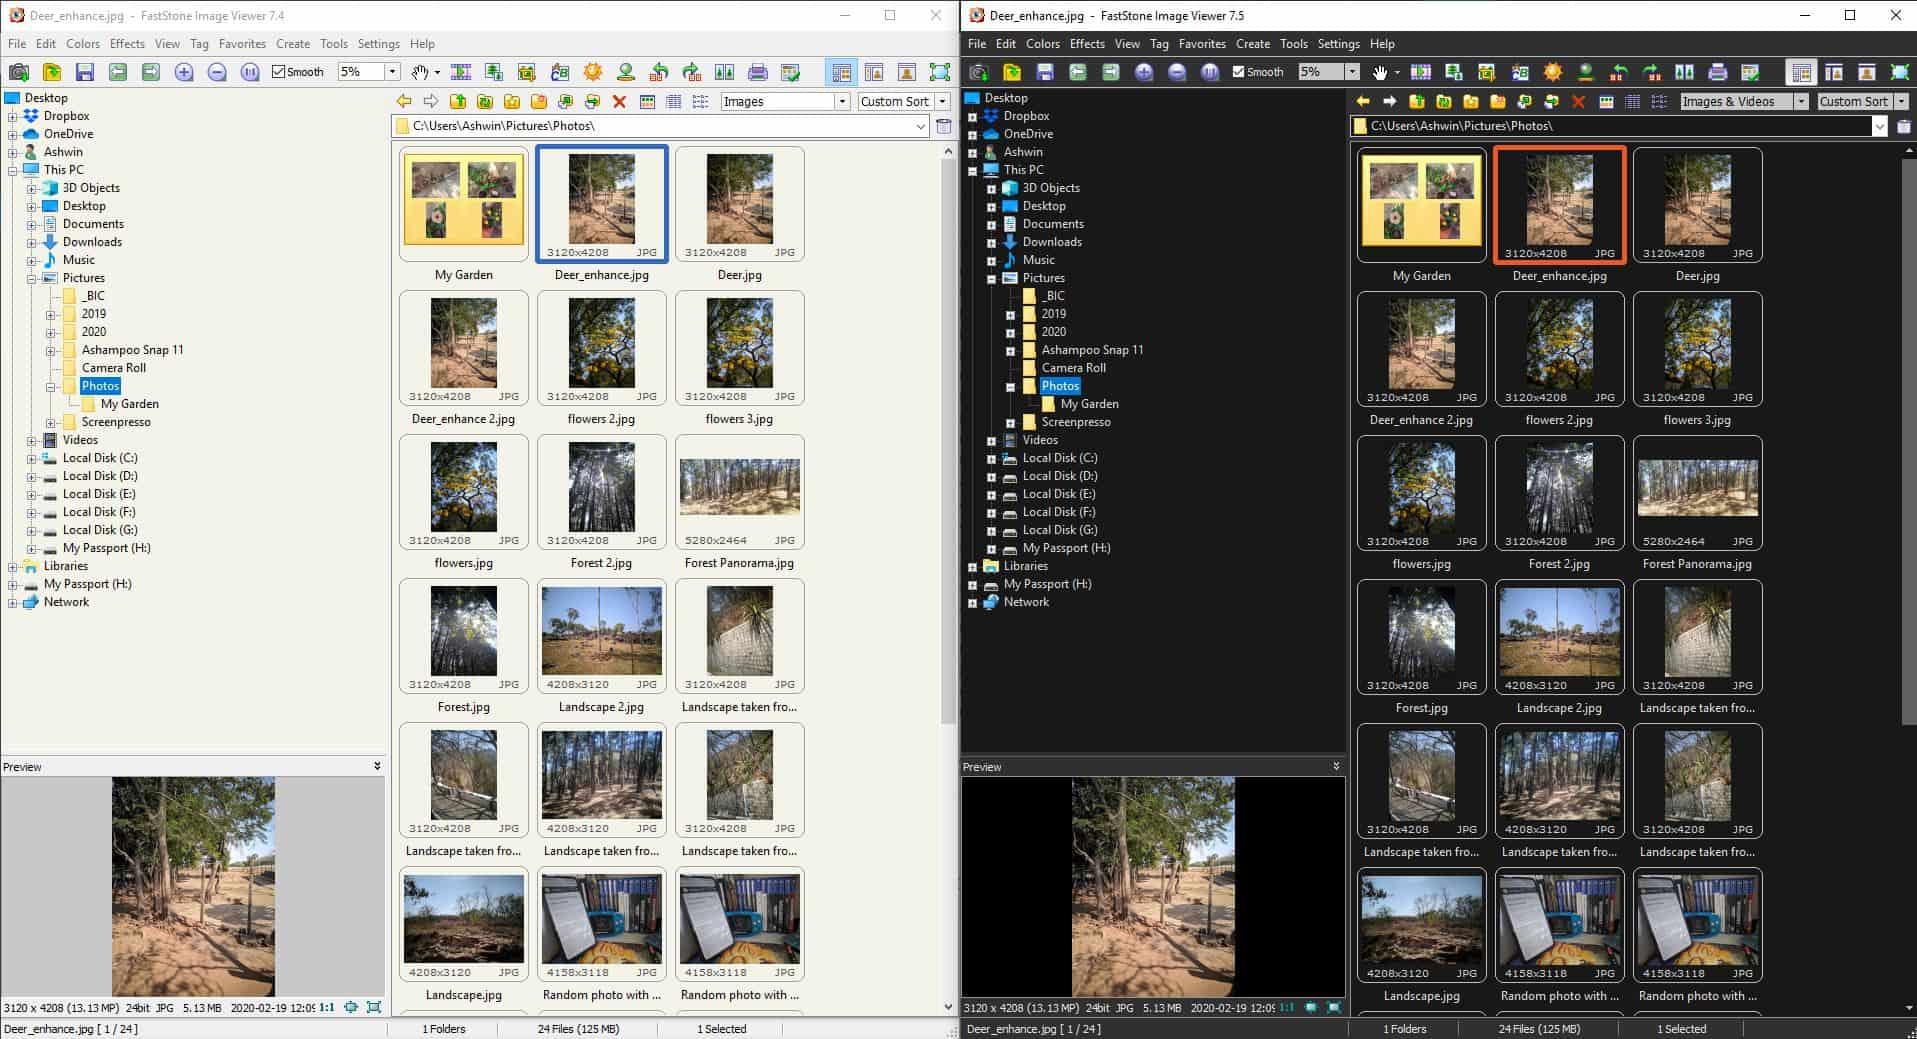 FastStone Image Viewer Bright Vs Dark theme